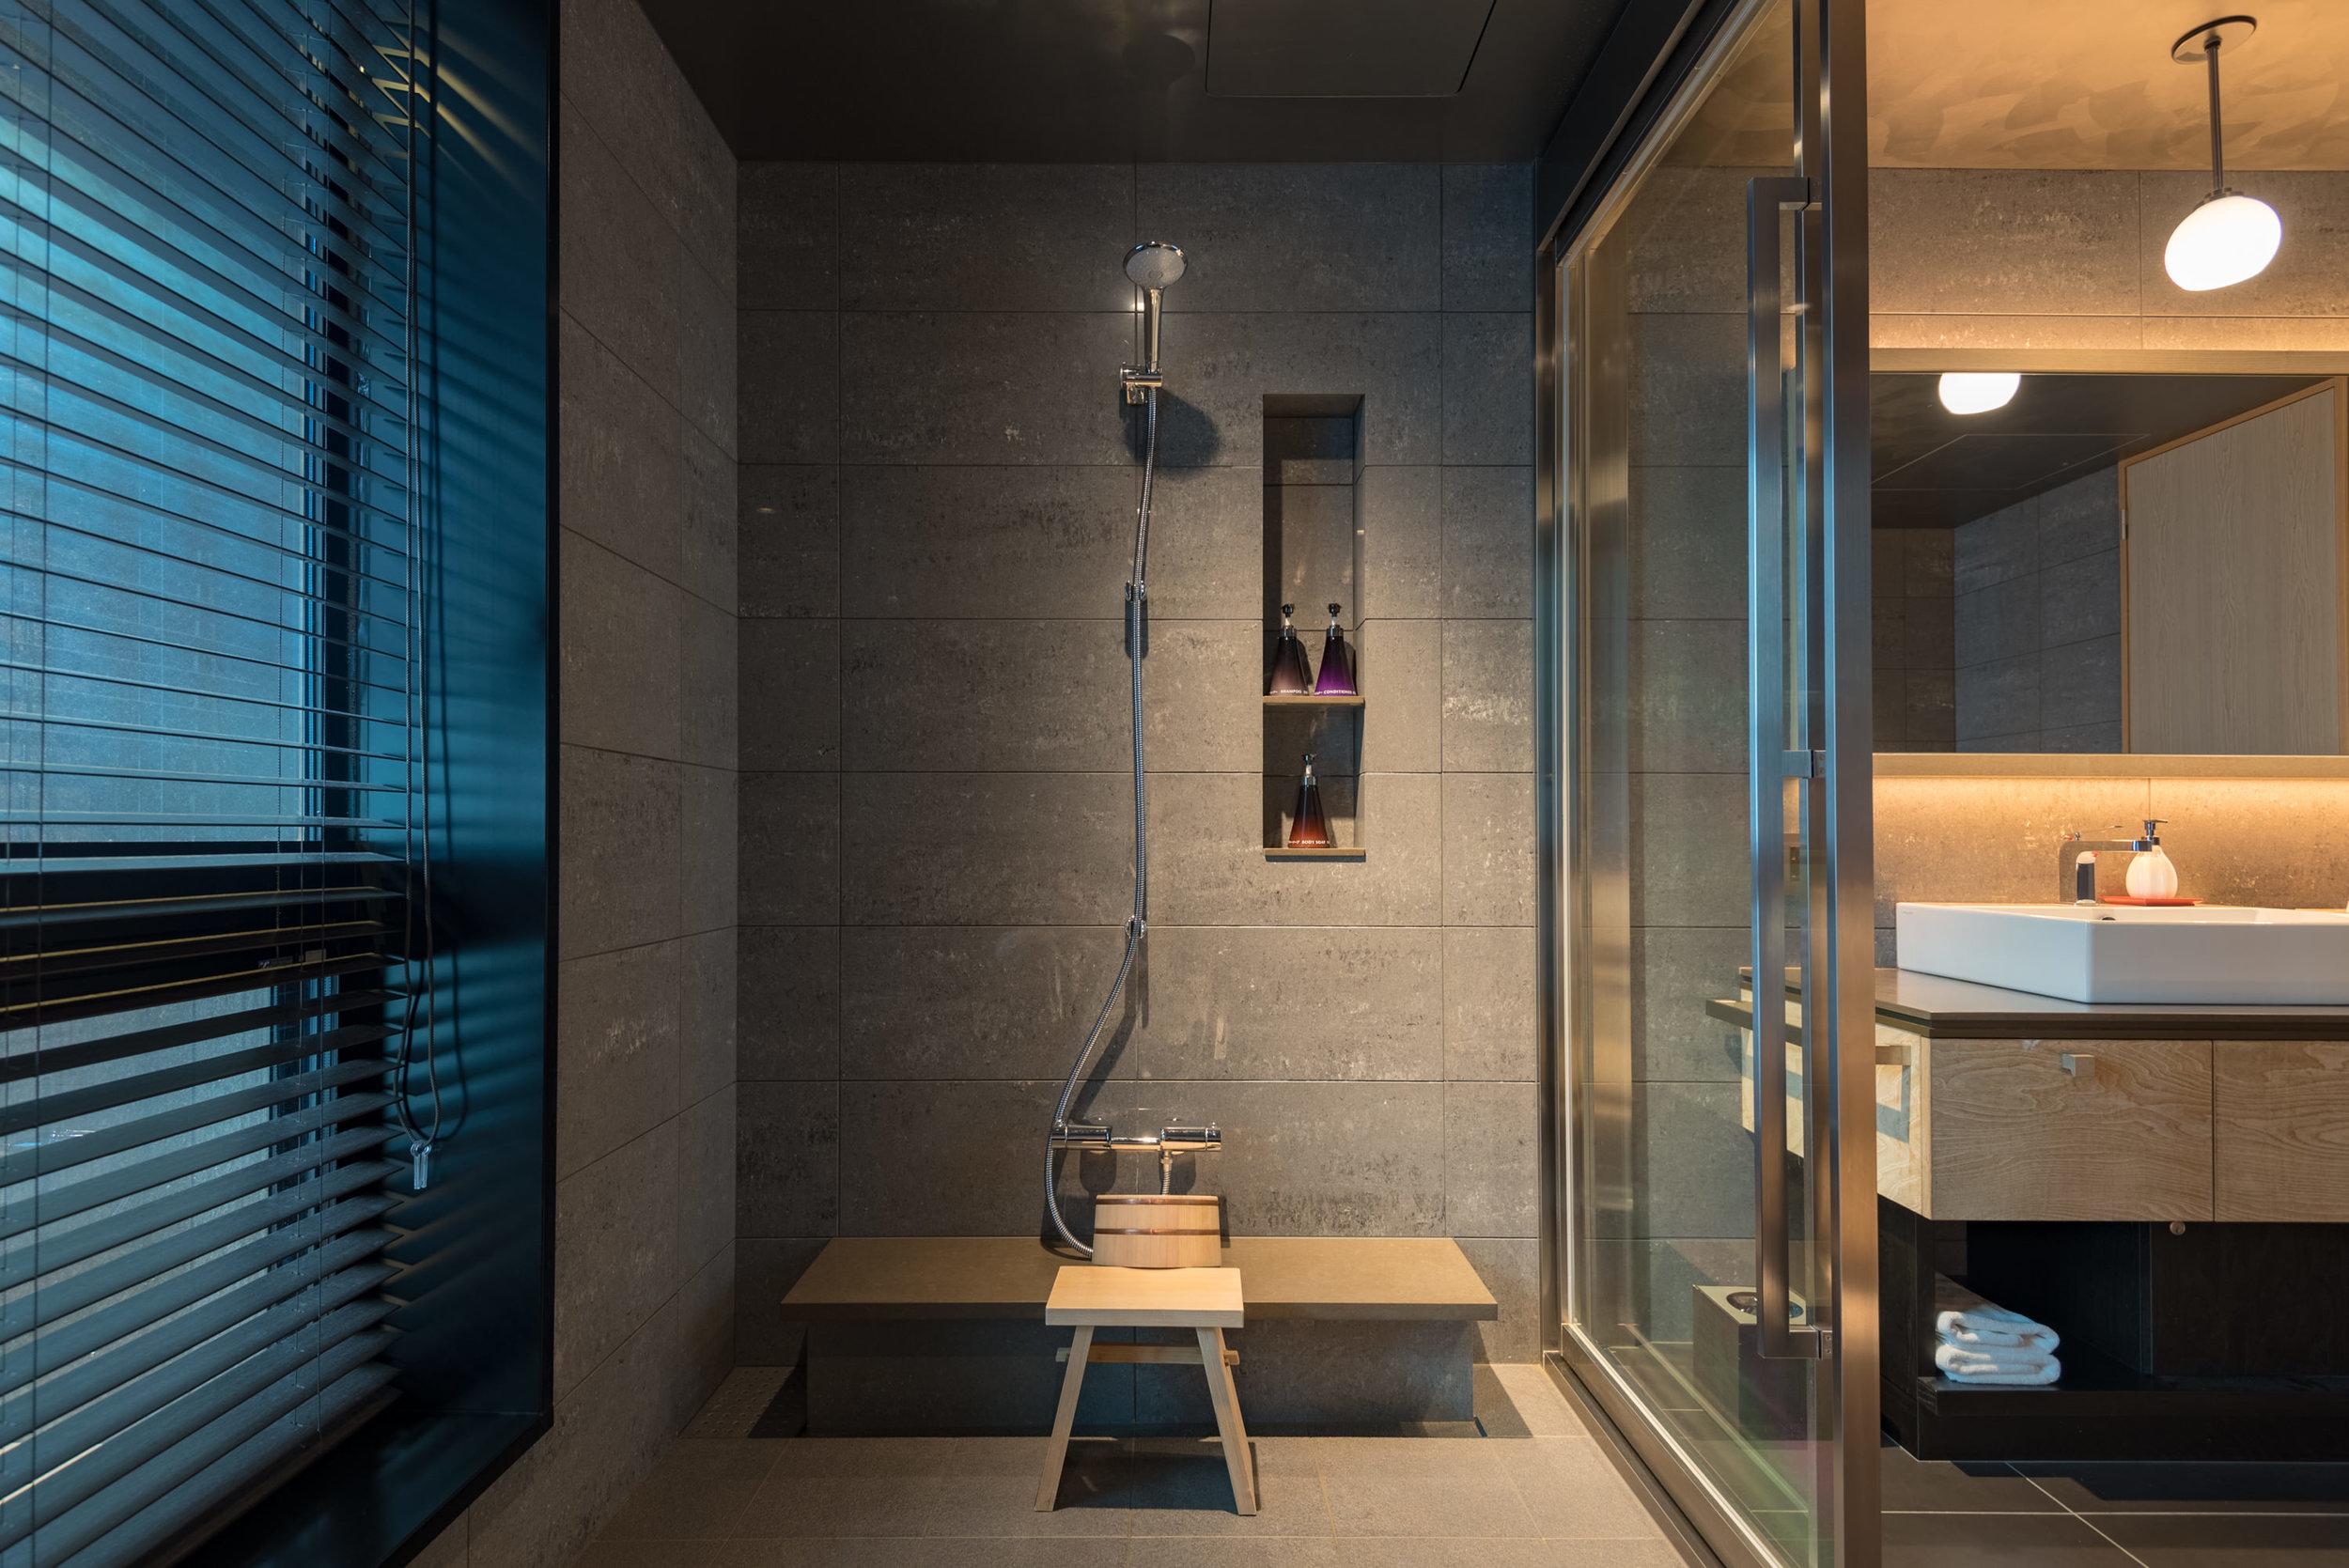 Hotel Review Hoshinoya Tokyo Kiku Luxurious Modern